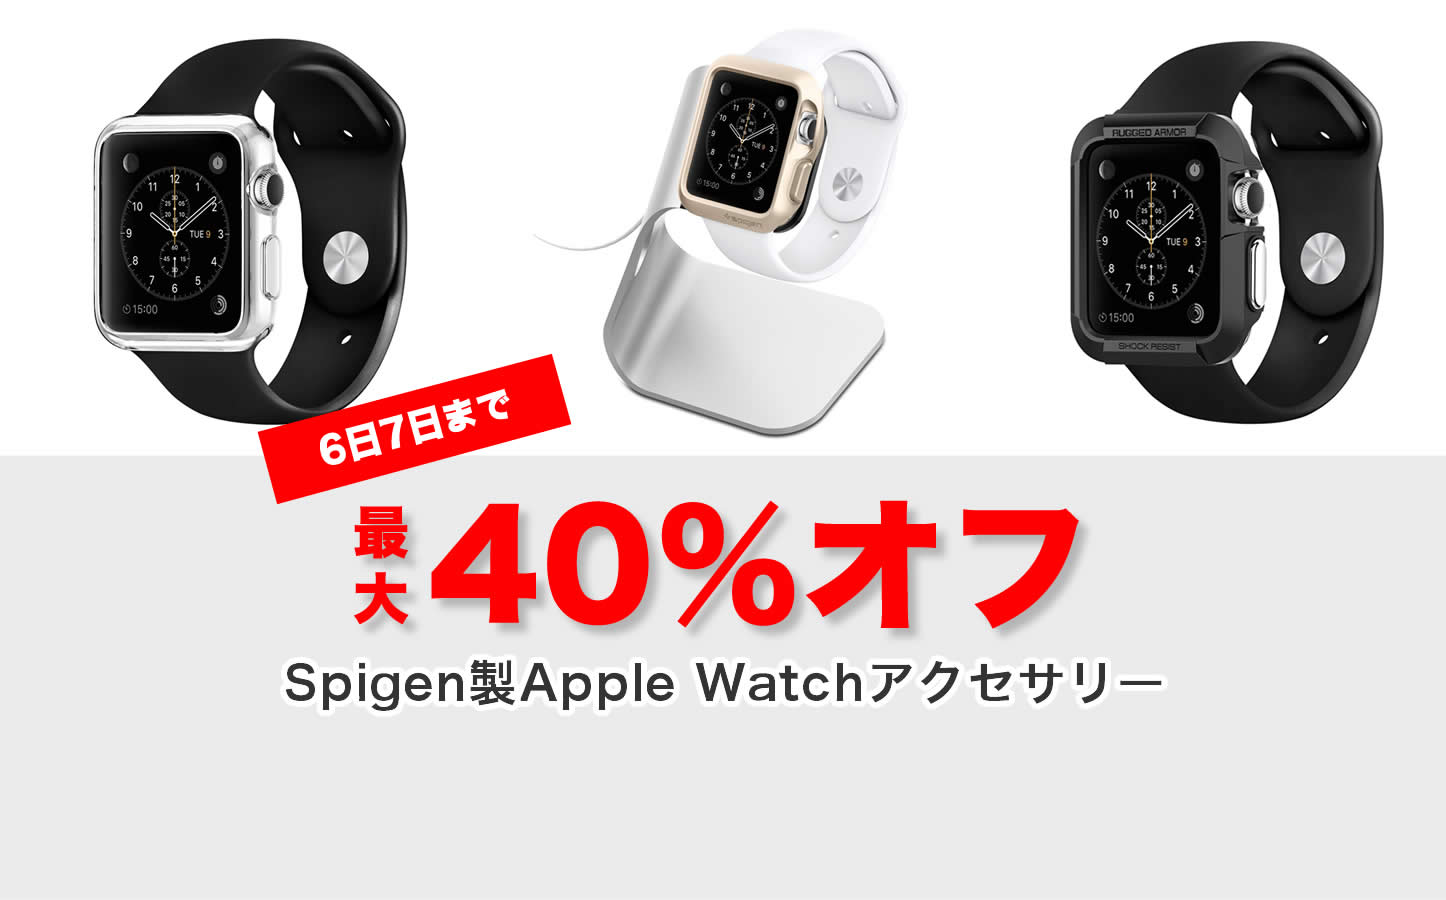 Spigen-Watch-Sale.jpg